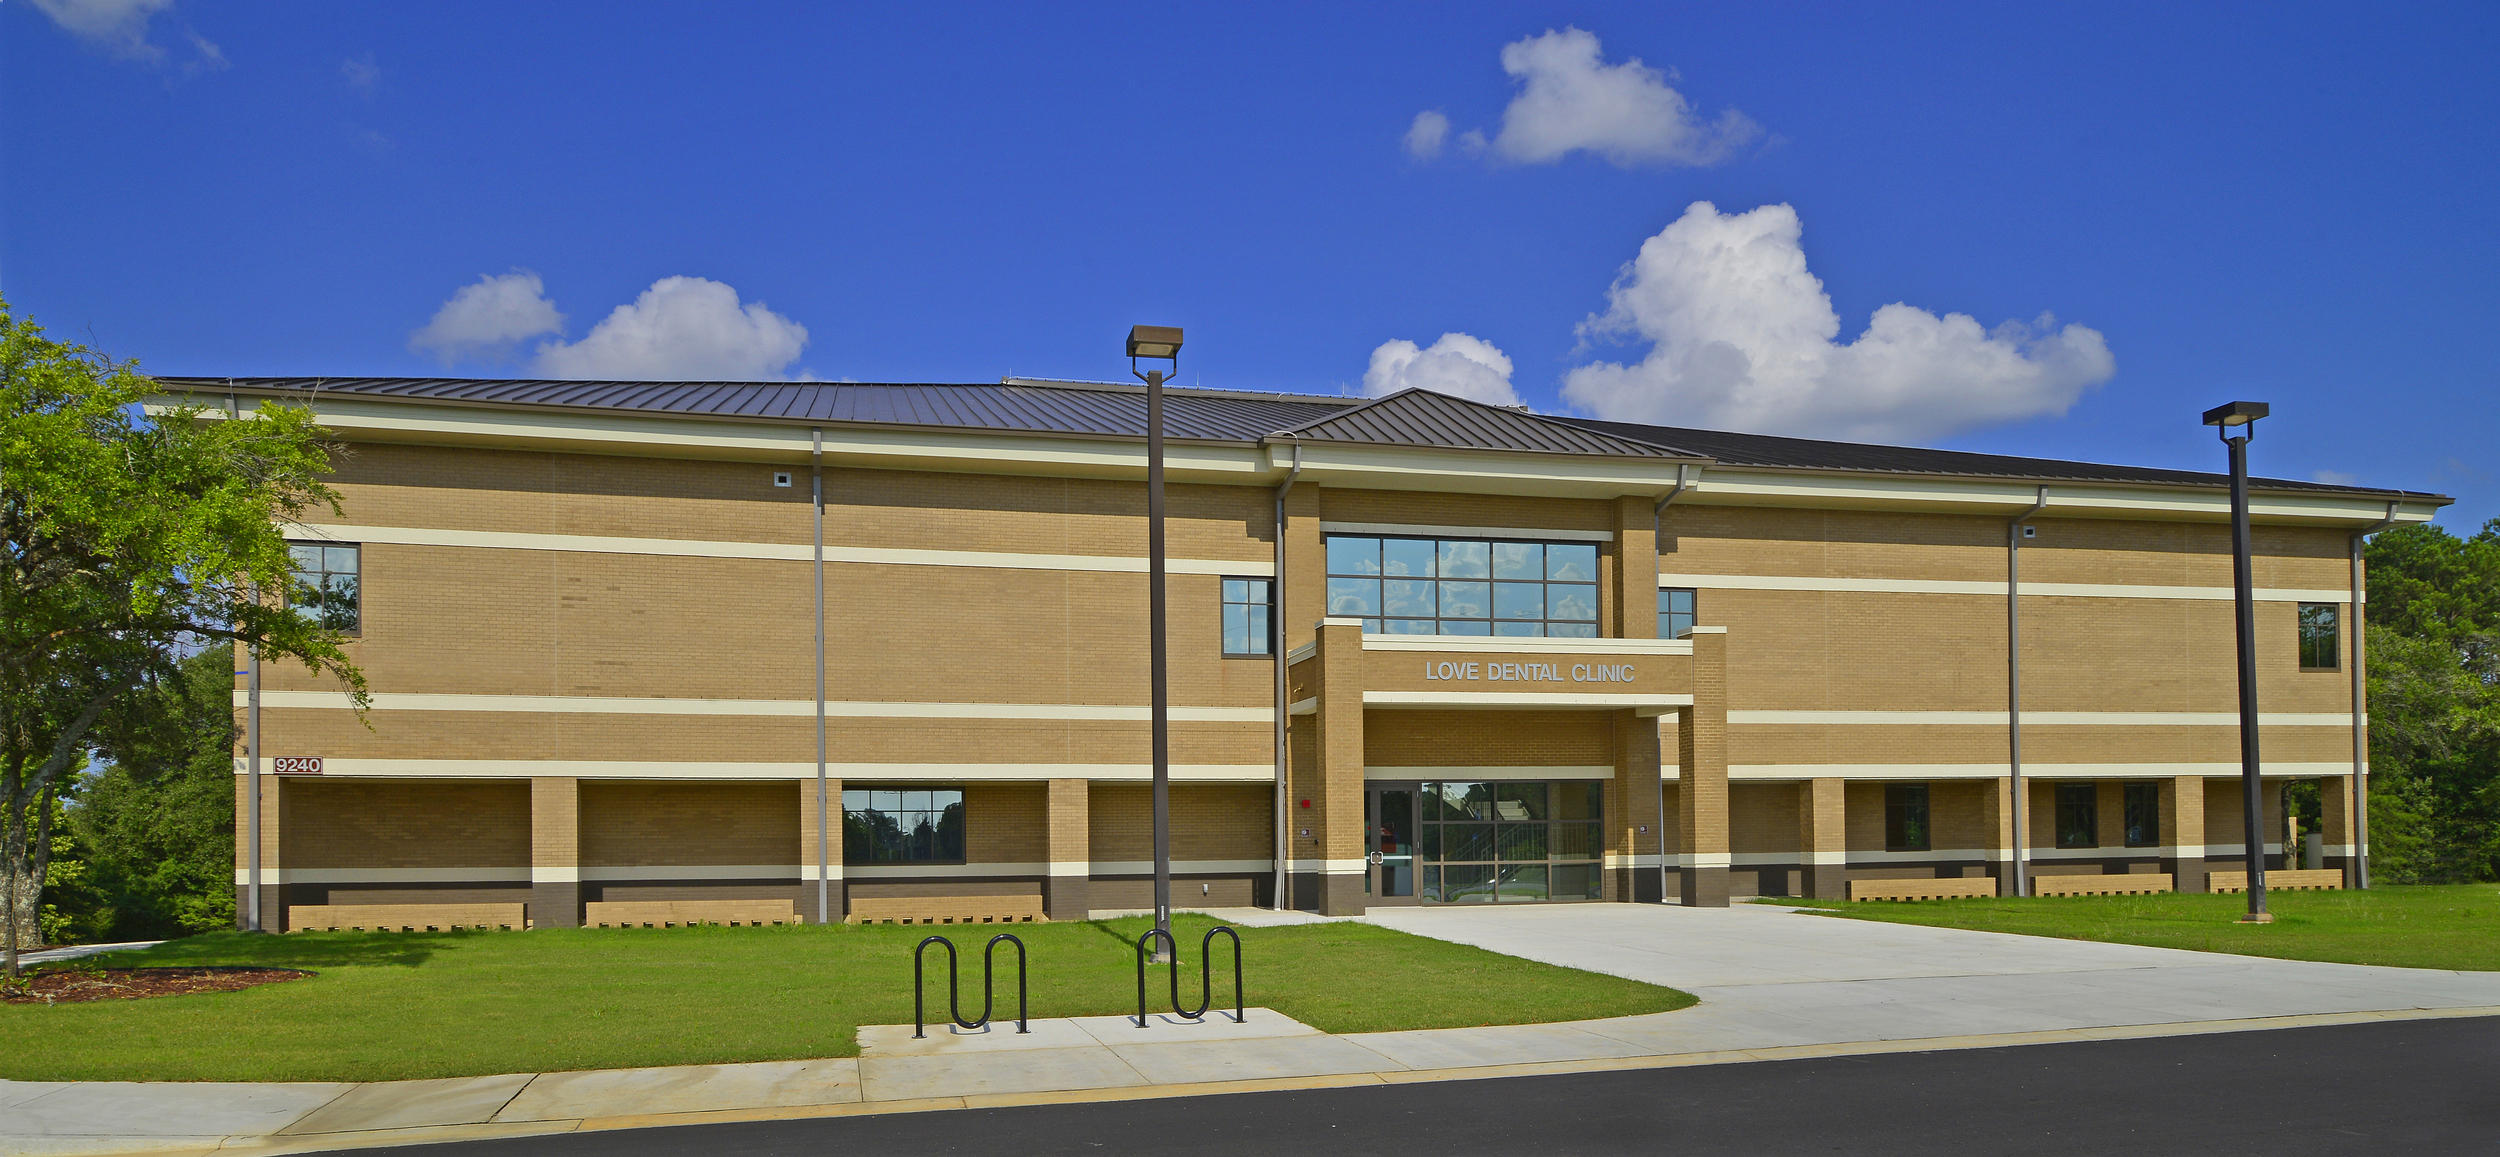 LOVE DENTAL CLINIC, BUILDING 9240   Ft. Benning, GA